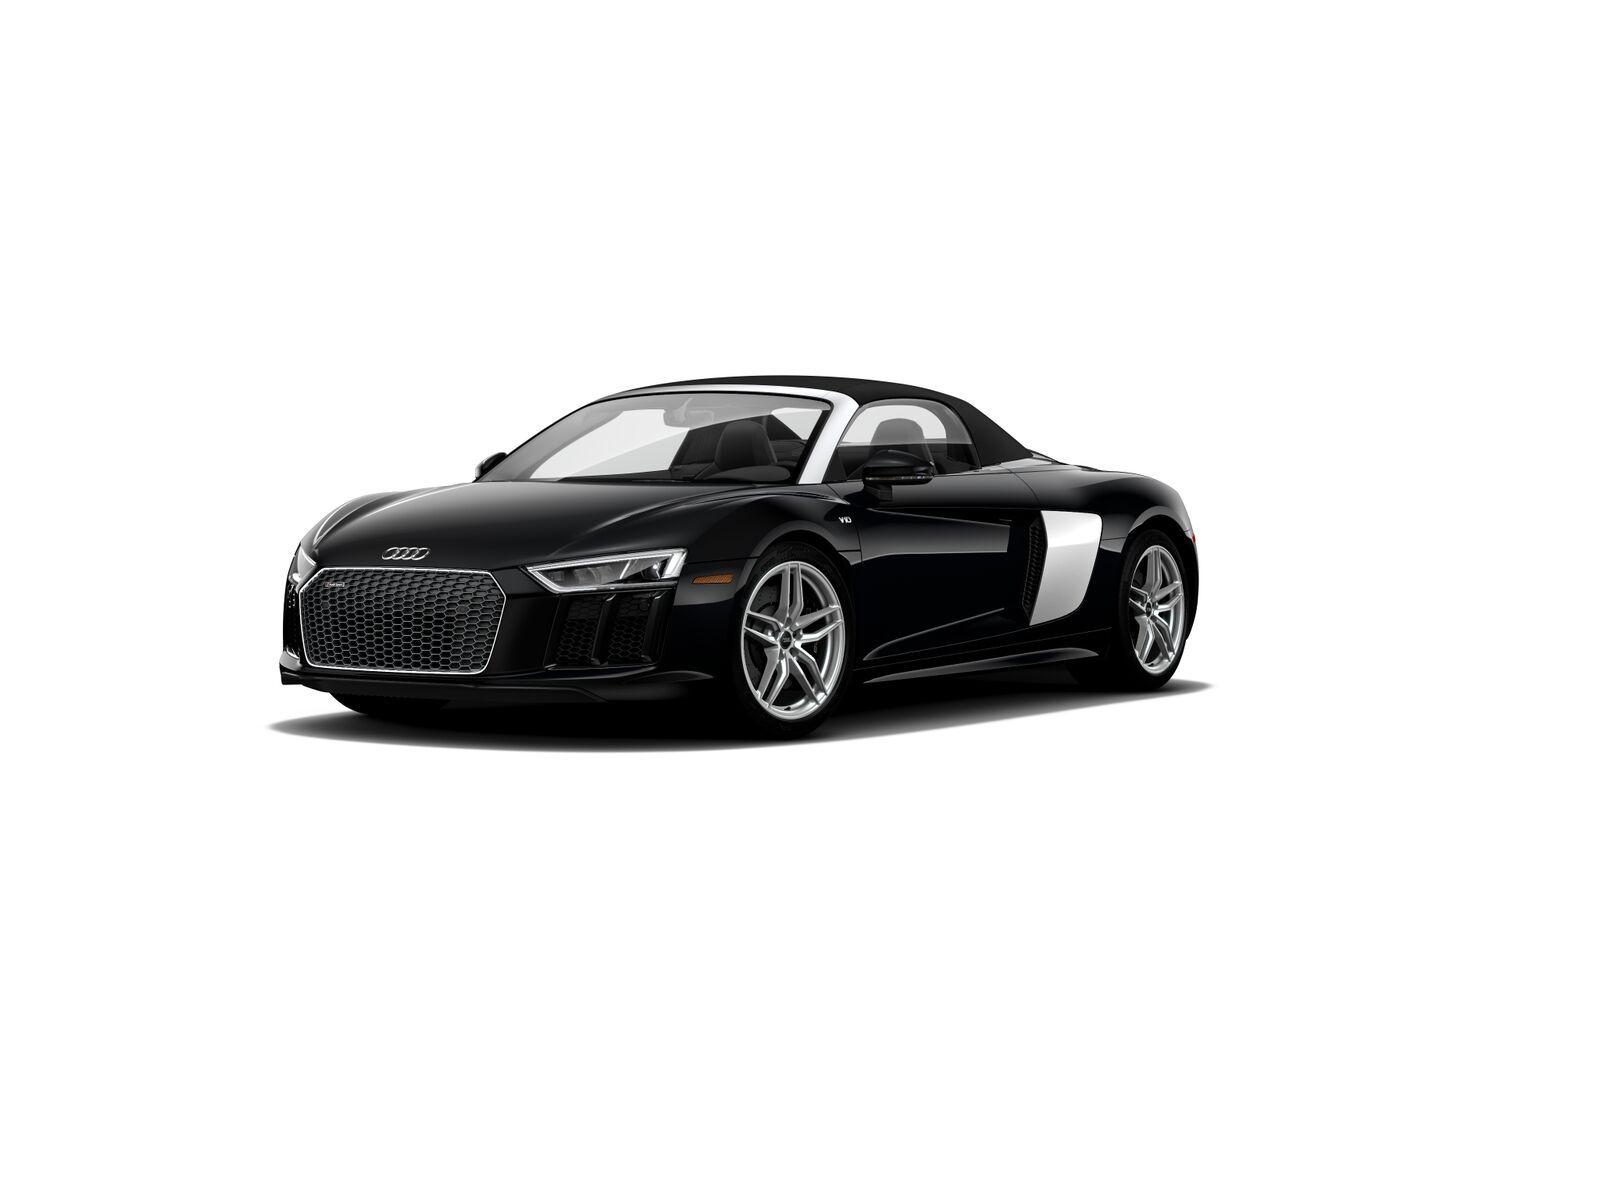 Build Your Own Custom Audi R Spyder Audi USA Audi USA - Audi usa models